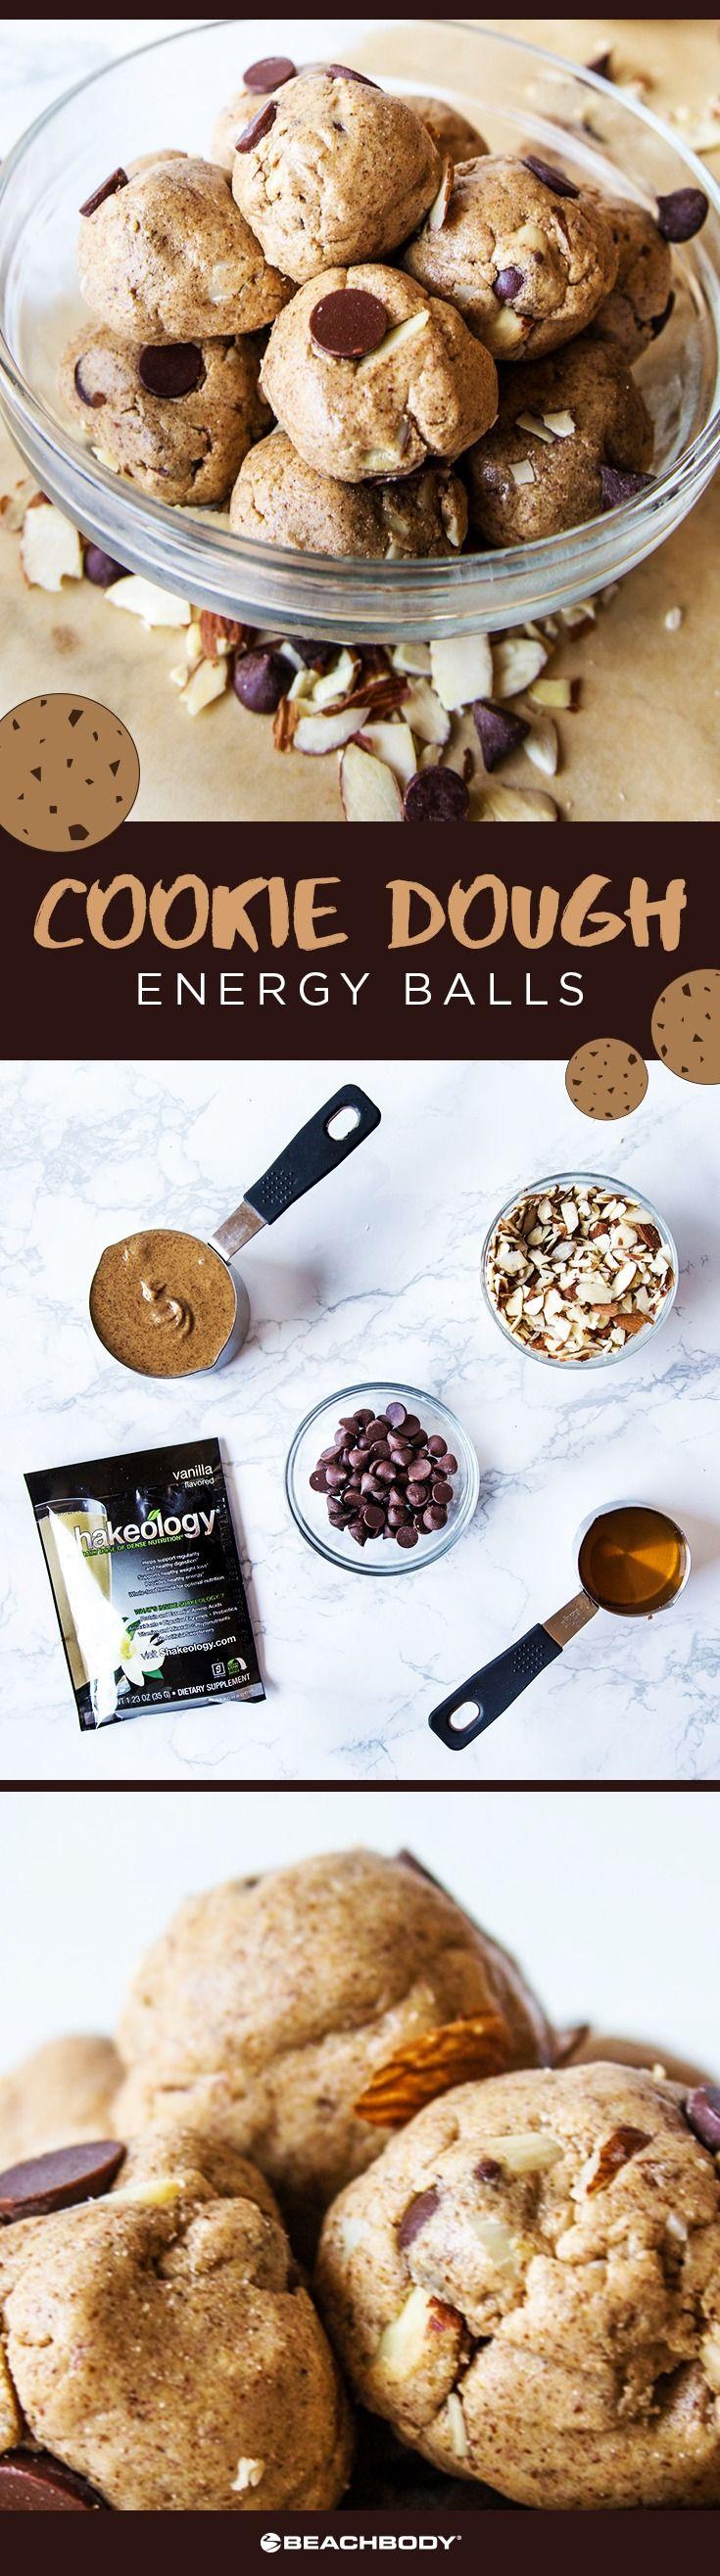 Shakeology cookie dough energy balls. Delicious and nutritious! Shakeology recipe // healthy cookie dough// 21 day fix// energy ball recipe// how to lose weight// sugar // healthy choices // vegetarian // Beachbody // BeachbodyBlog.com